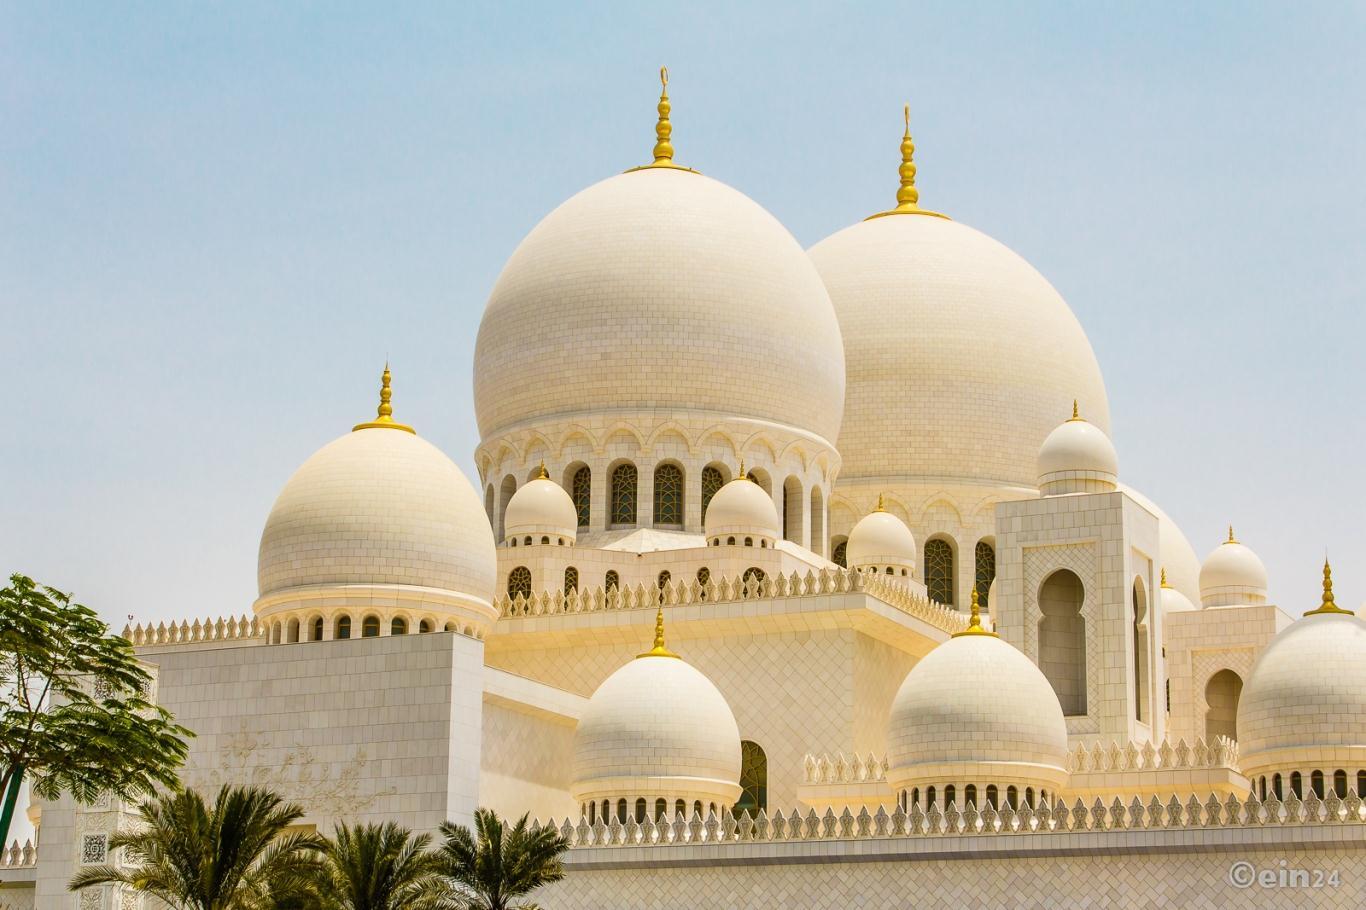 thanh duong sheikh zayed 541f8948d313b